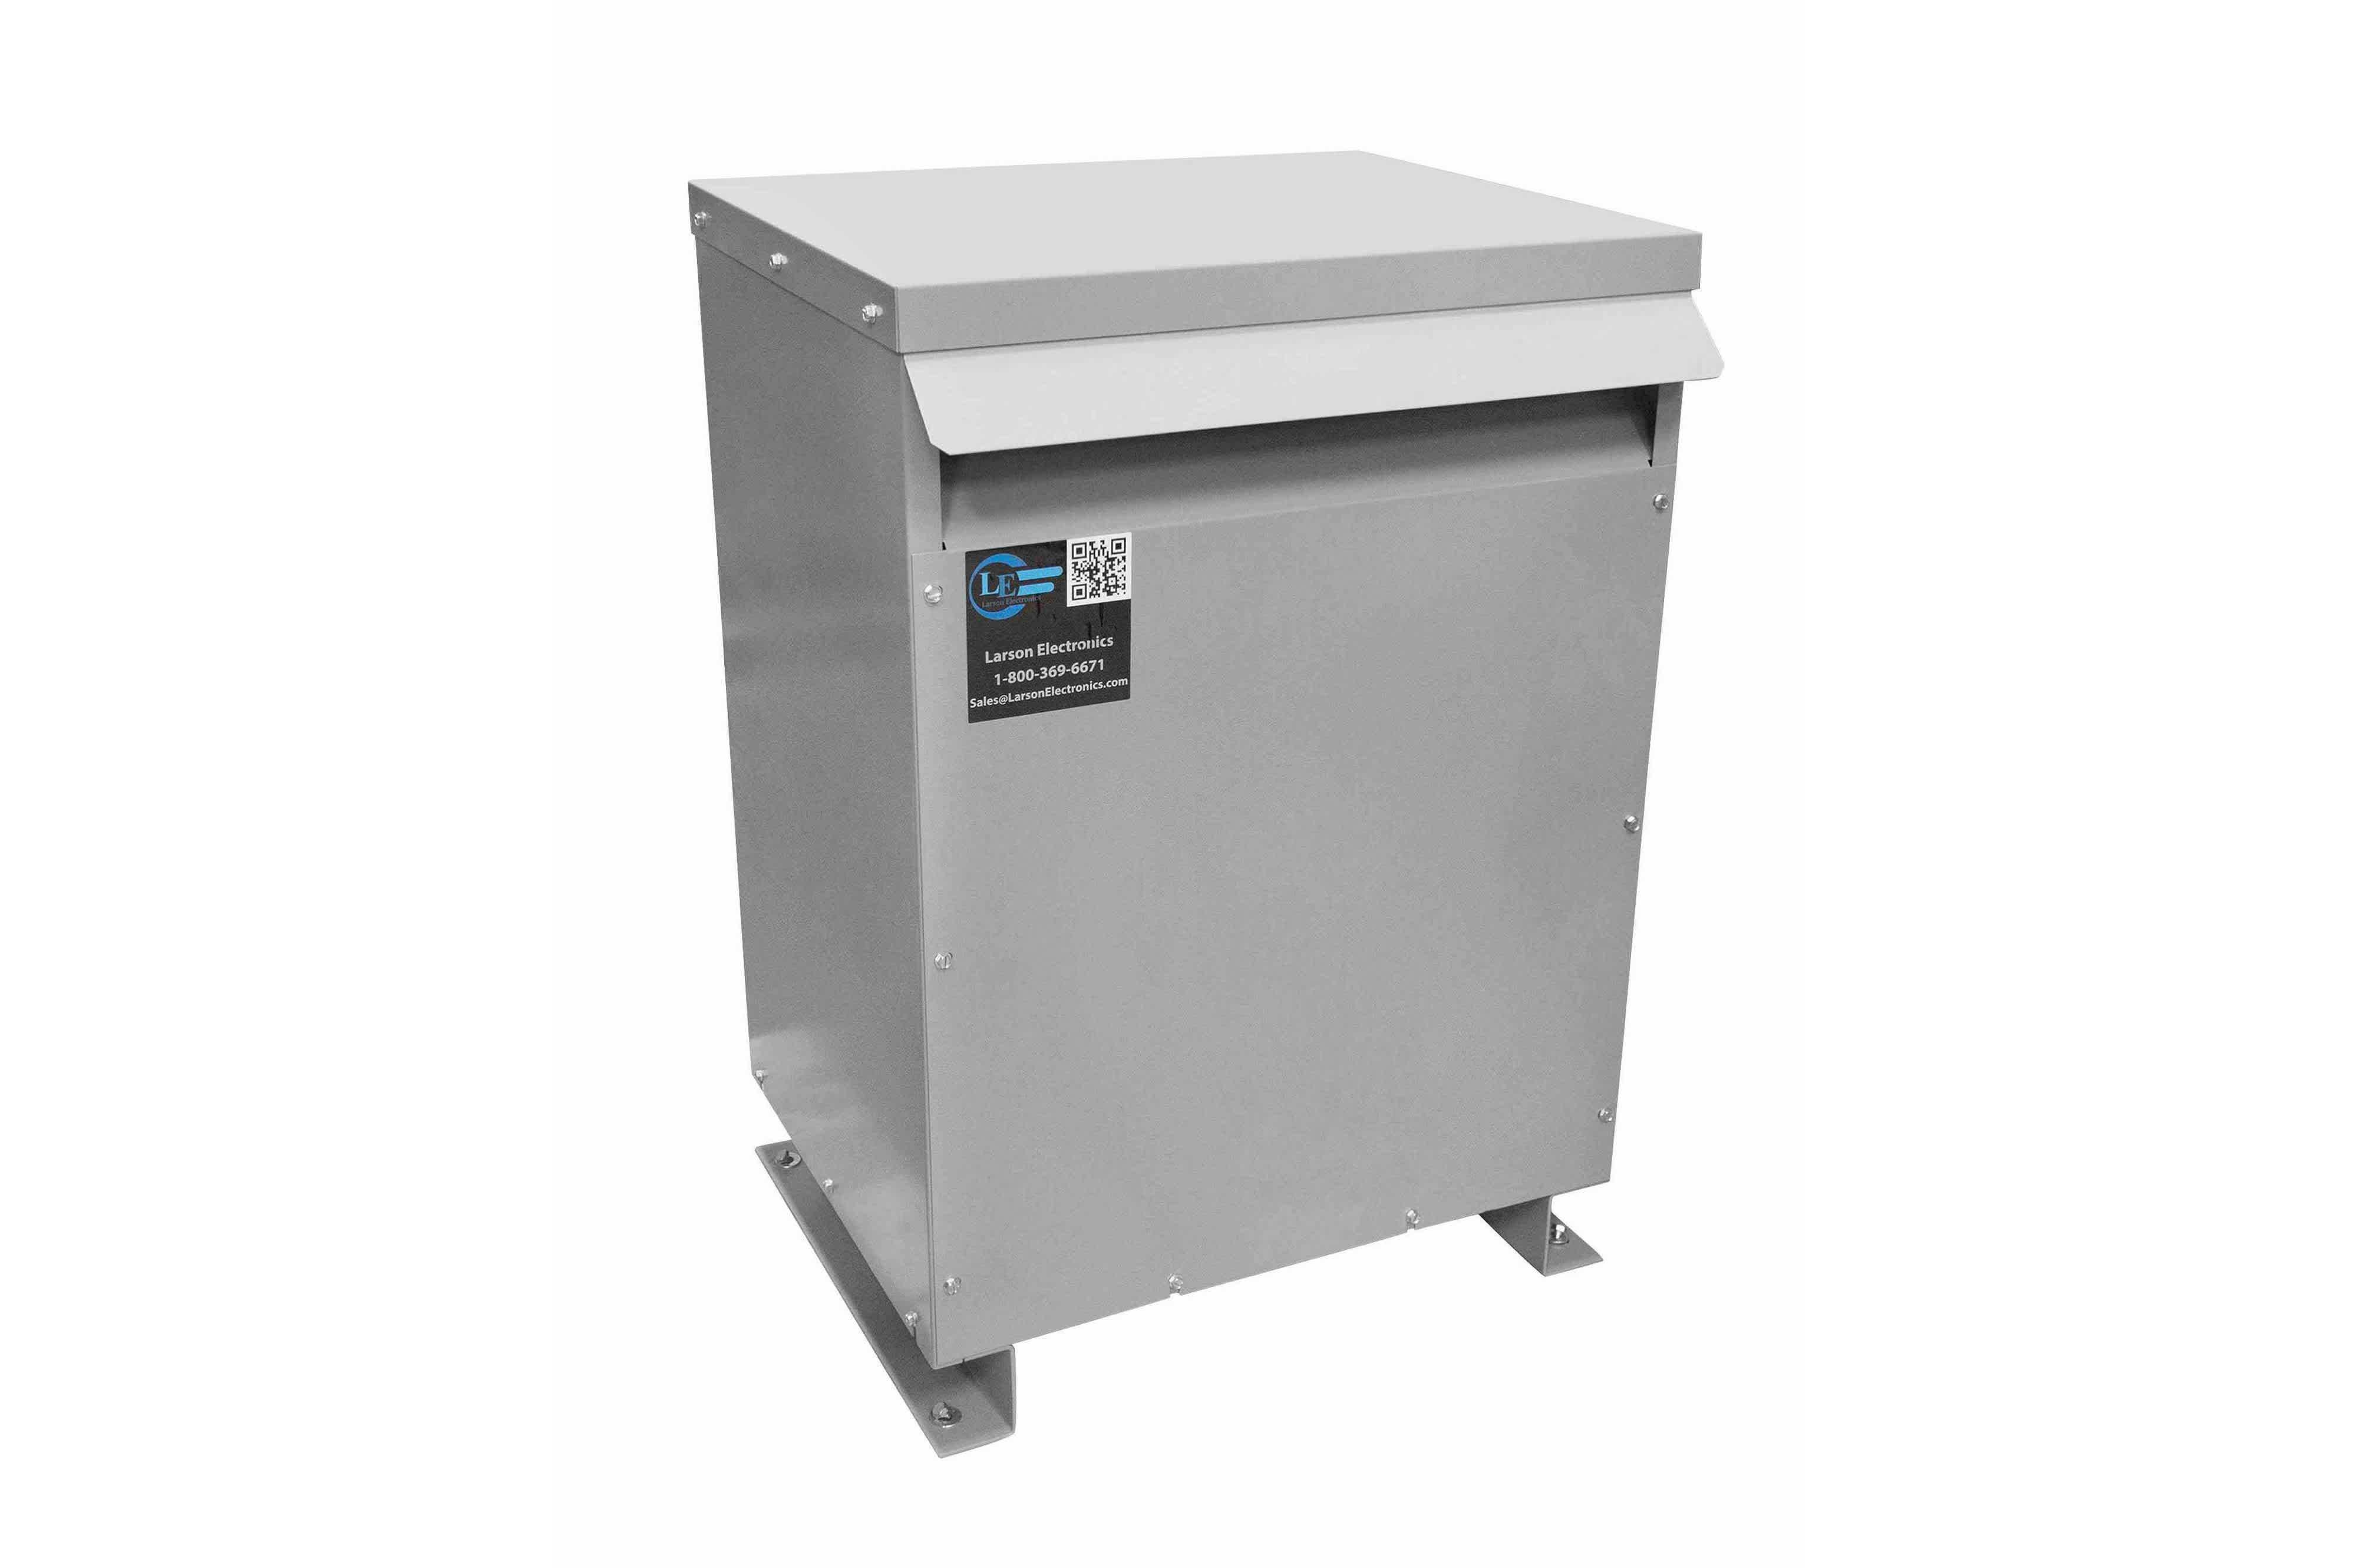 90 kVA 3PH Isolation Transformer, 575V Wye Primary, 240V/120 Delta Secondary, N3R, Ventilated, 60 Hz